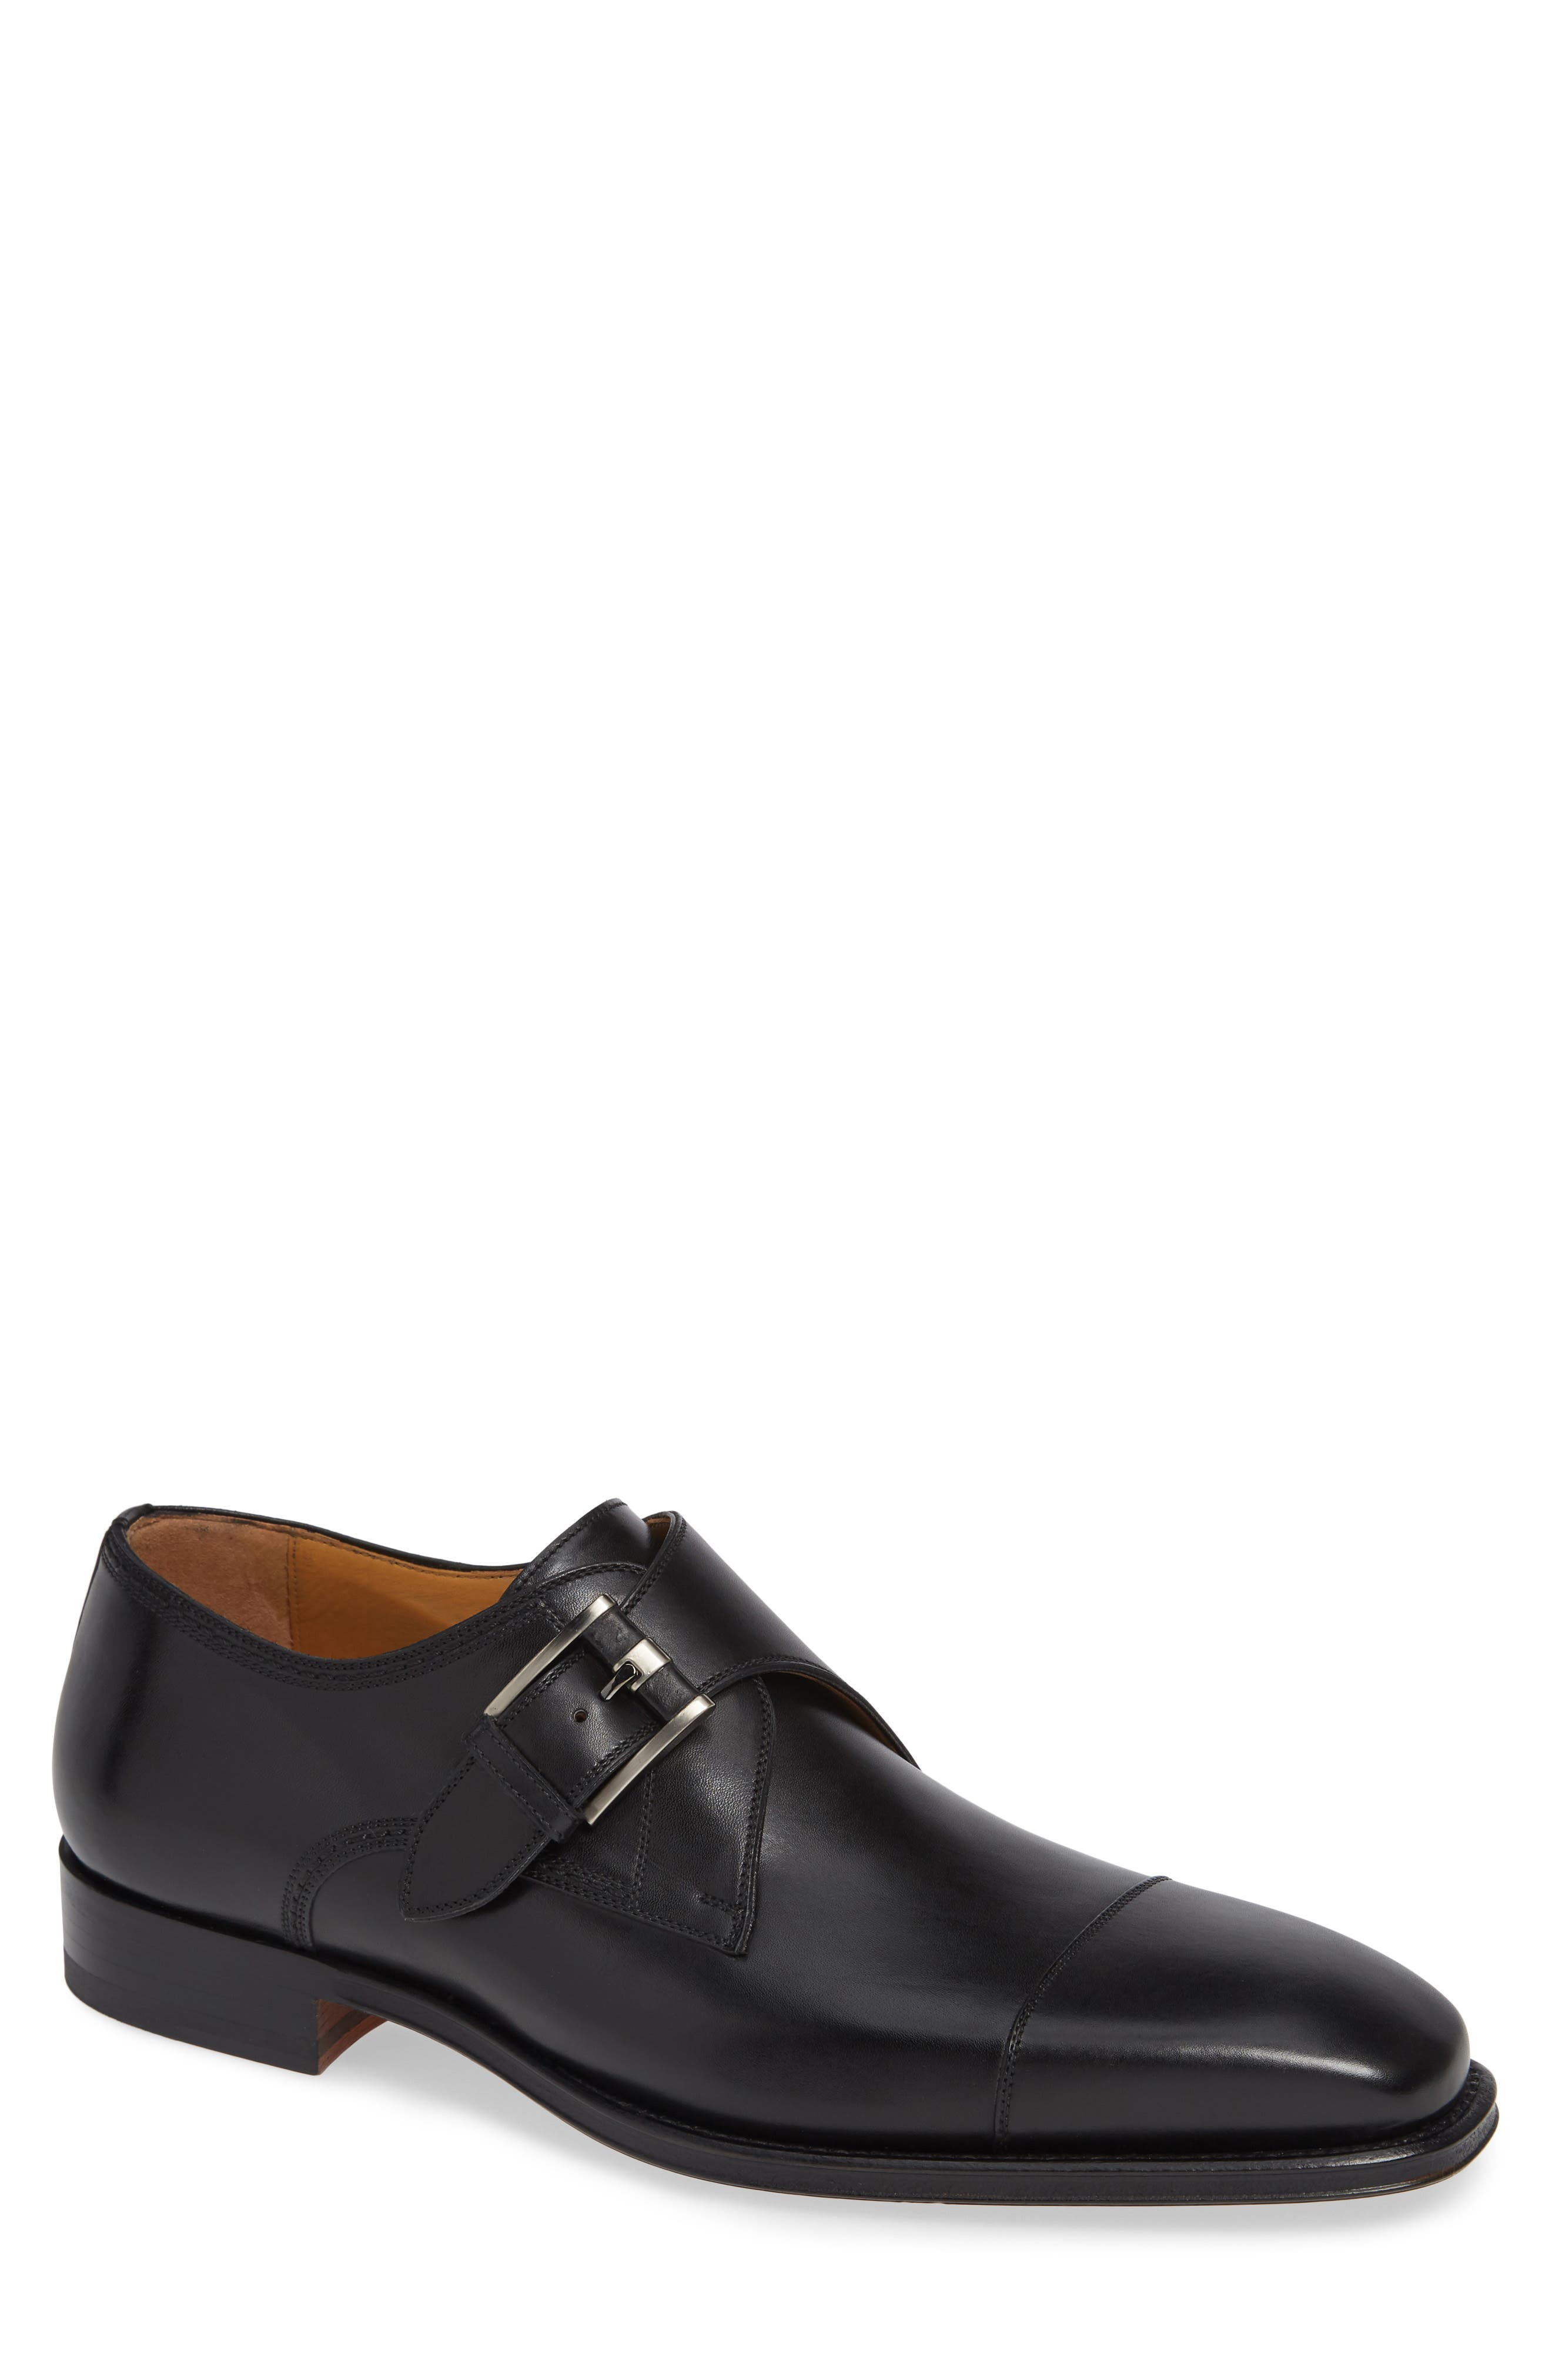 Lennon Monk Strap Shoe,                             Main thumbnail 1, color,                             BLACK LEATHER